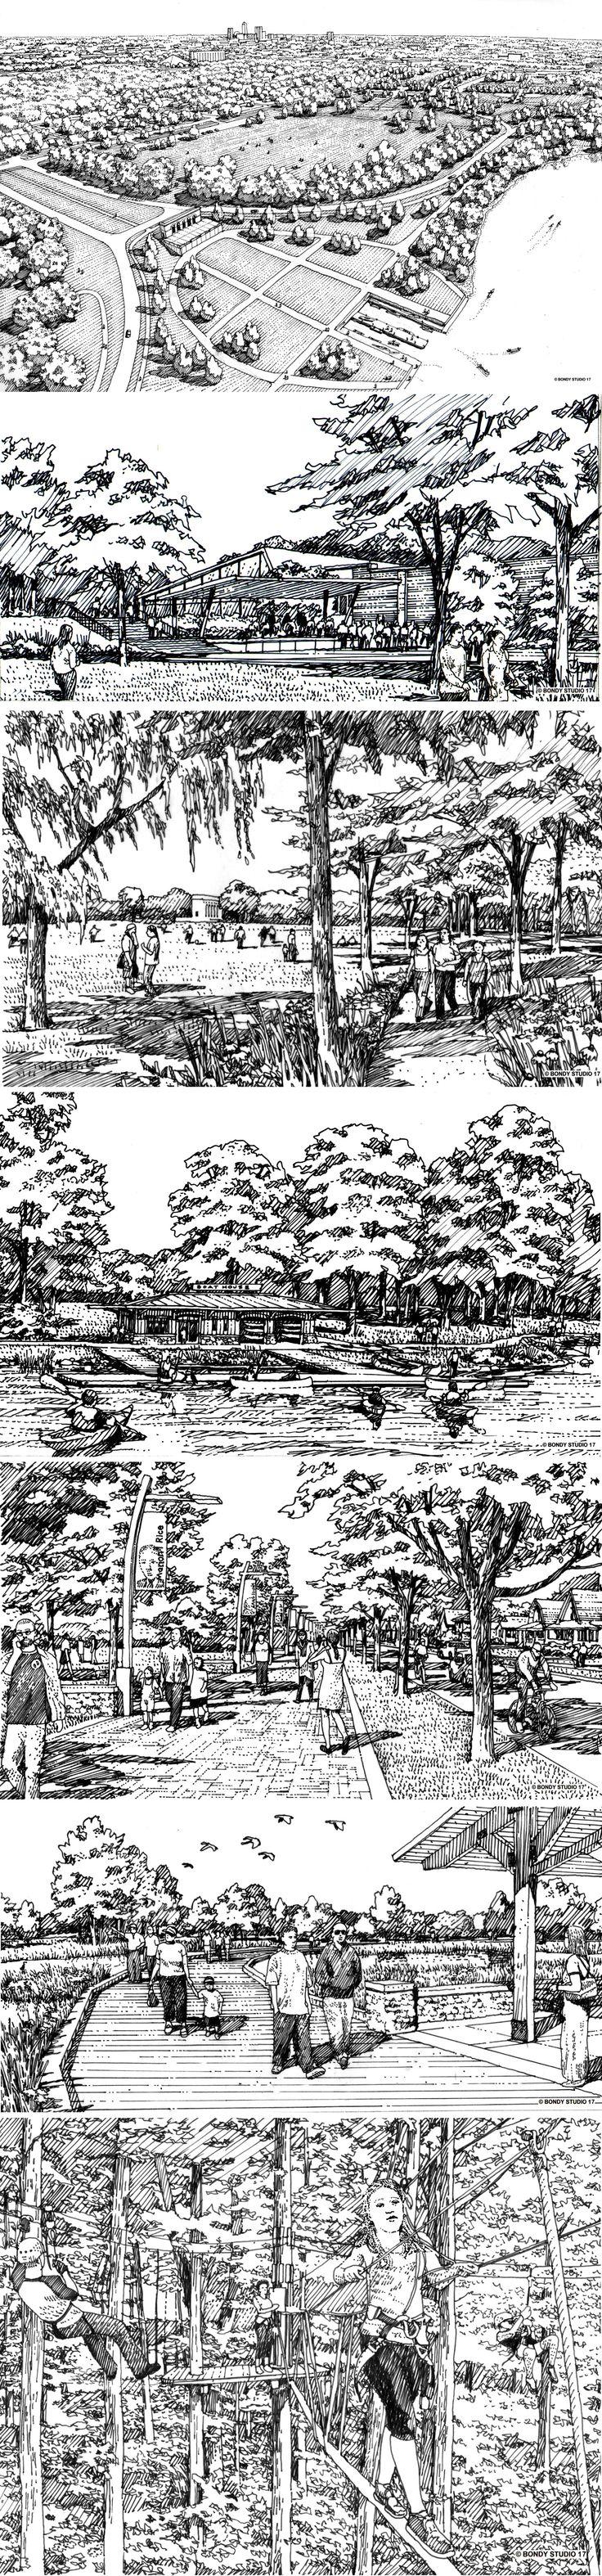 Ratio indianapolis riverside park urband design - Charrette dessin ...